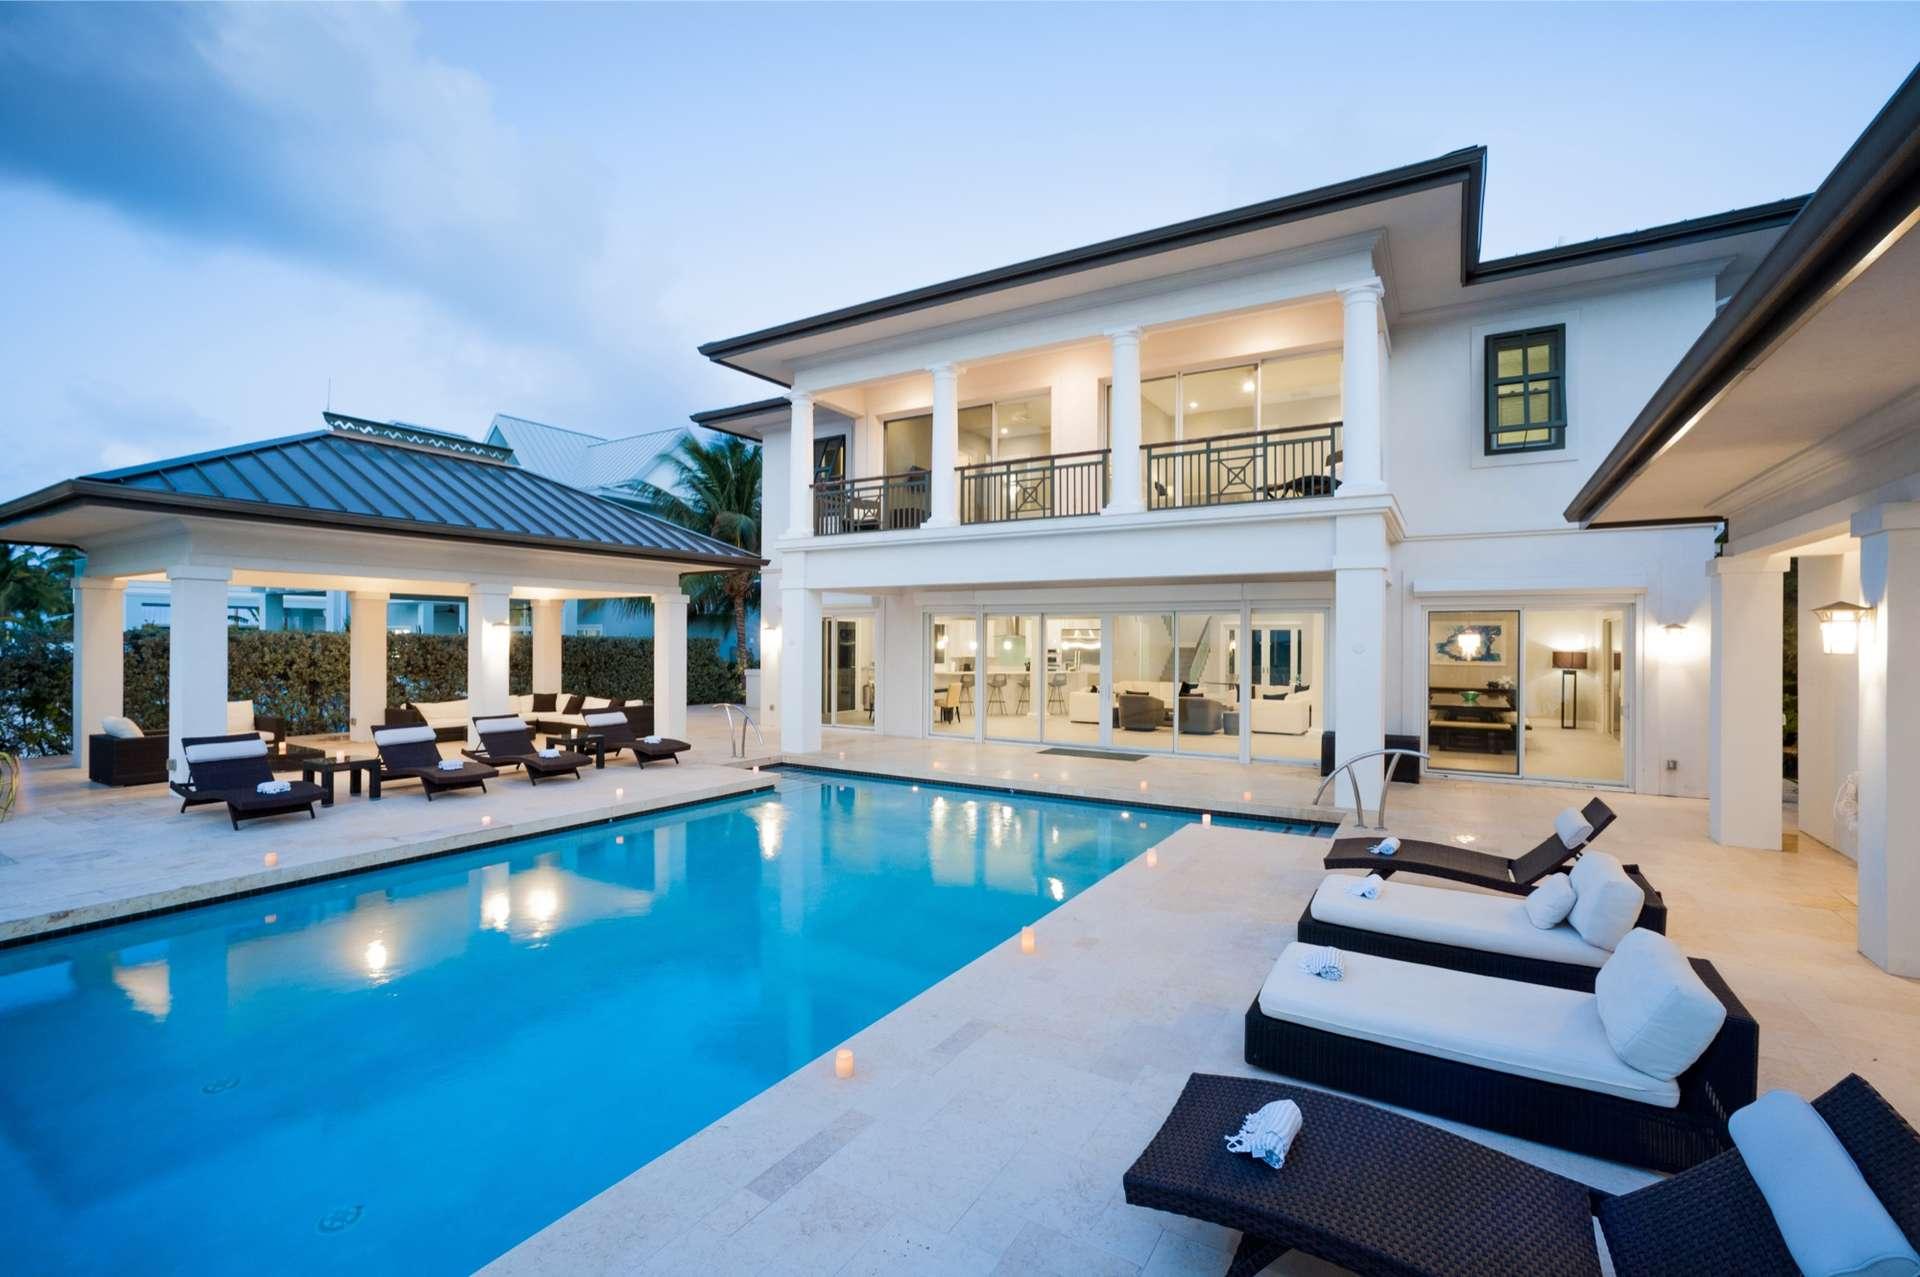 Luxury villa rentals caribbean - Cayman islands - Grand cayman - Rum point - Sun Salutations - Image 1/29